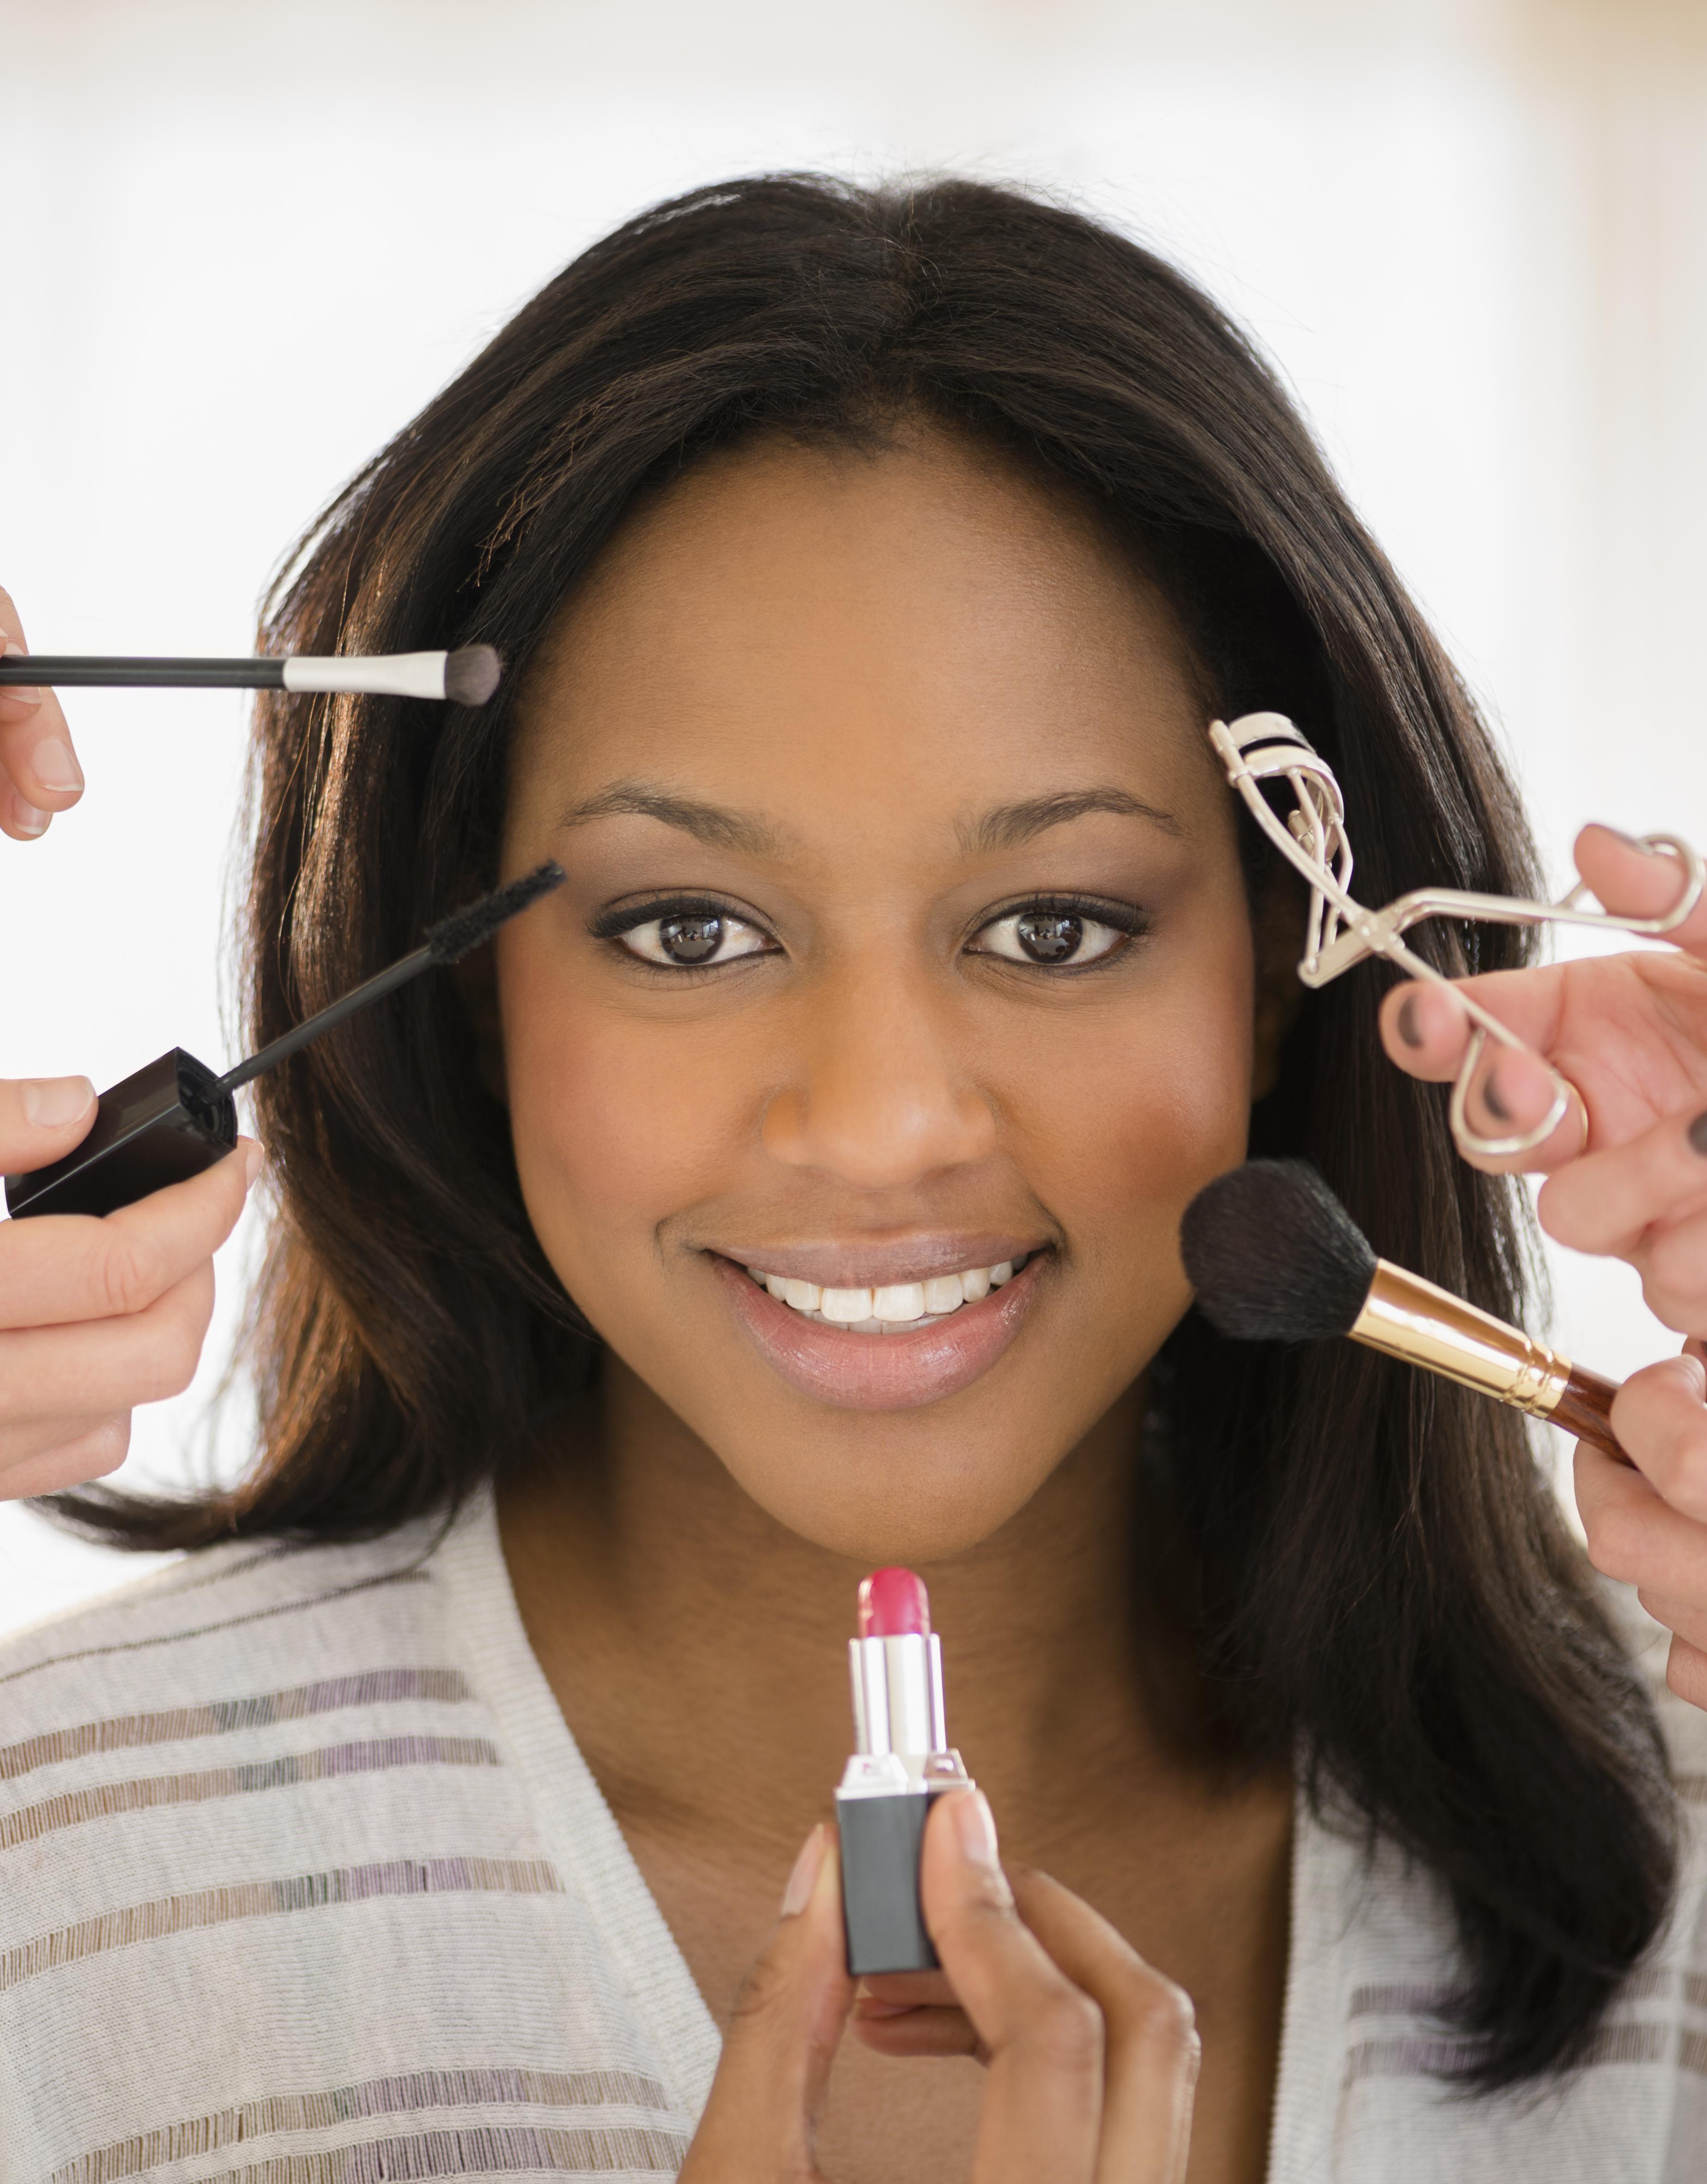 African American woman having makeup applied